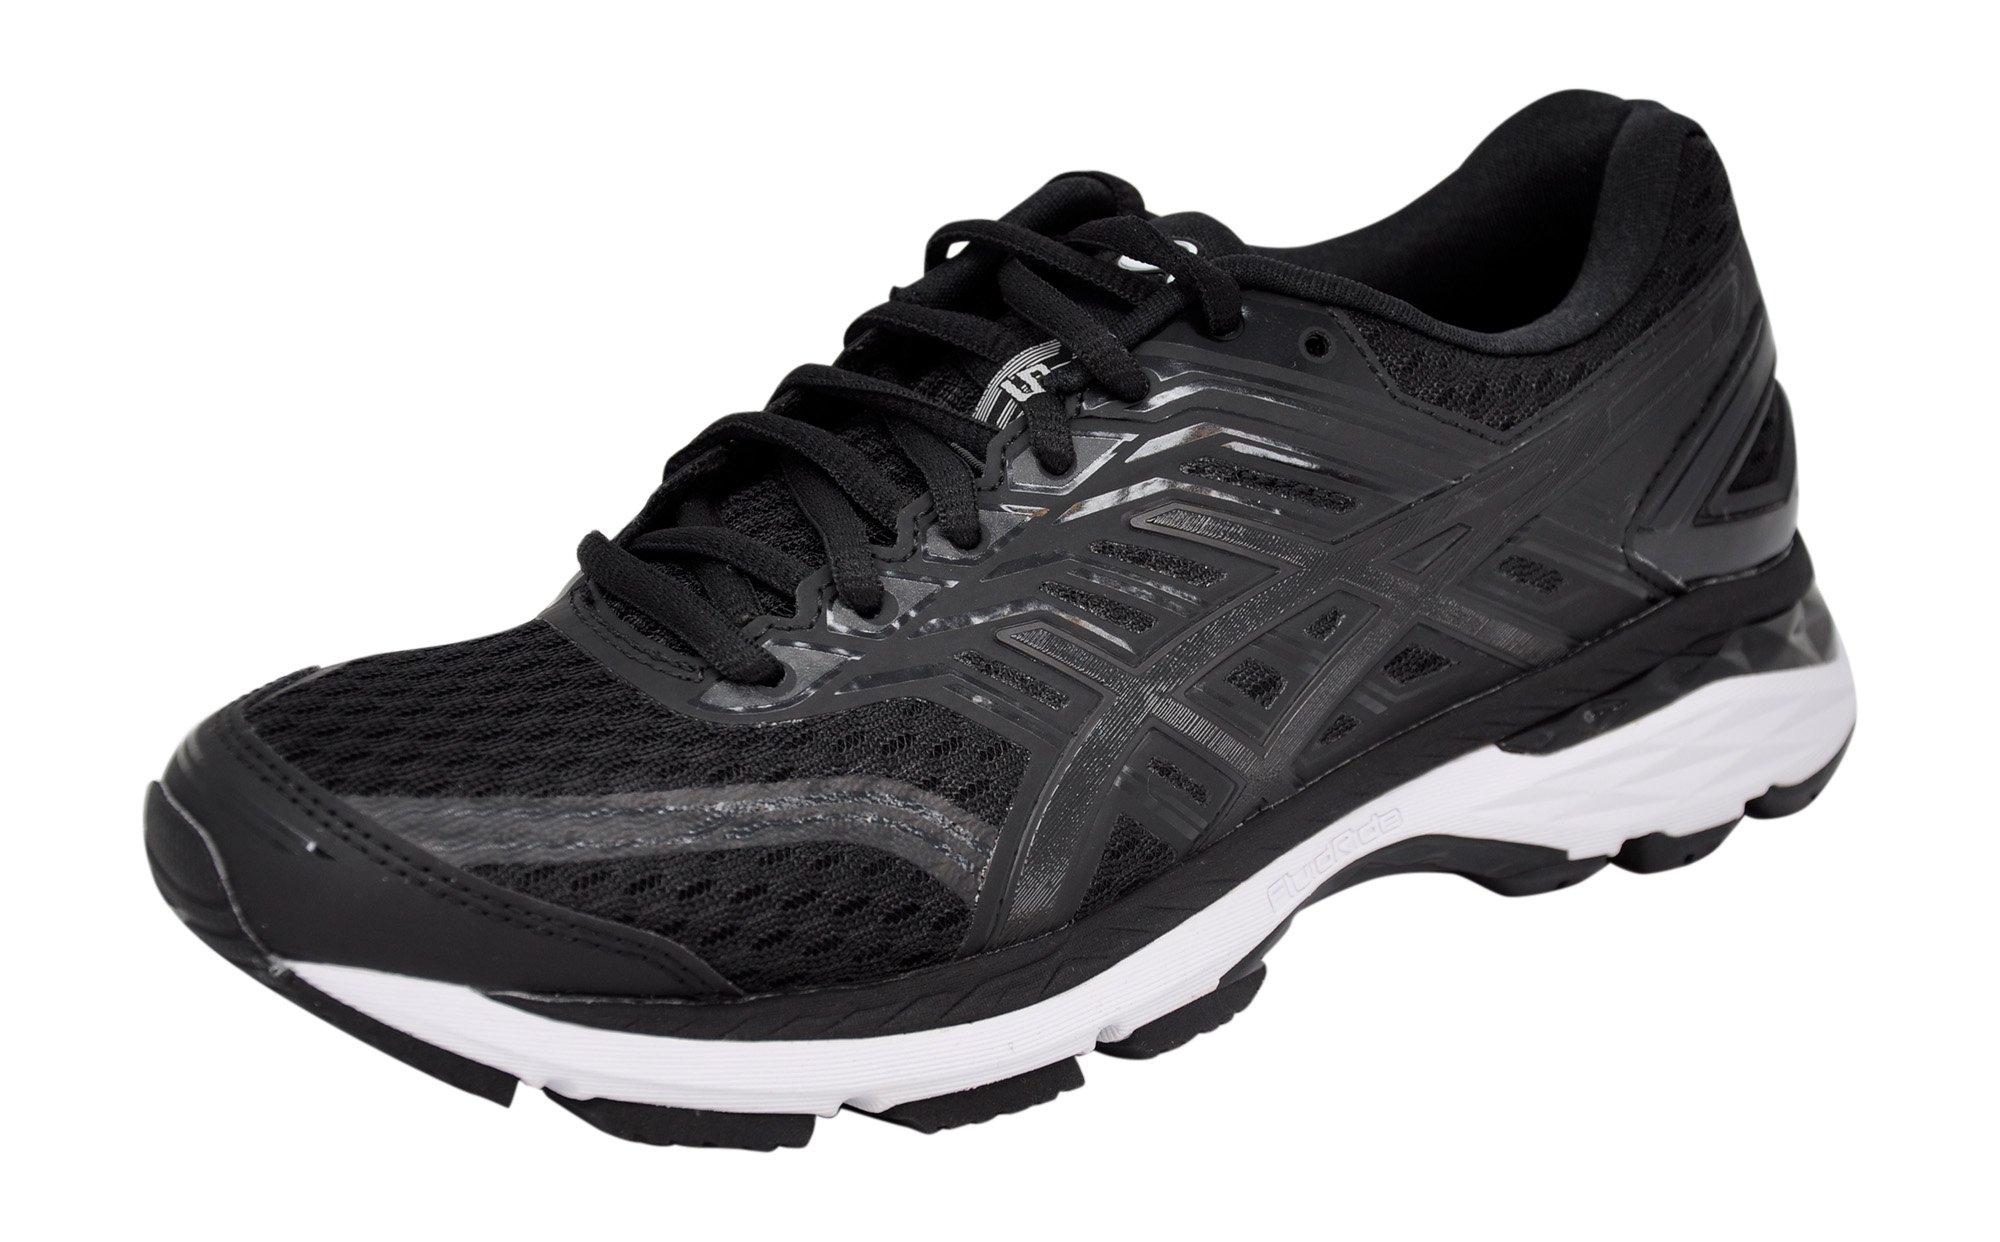 ASICS Womens GT-2000 5 Running Shoe, Black/Onyx/White, 9 B(M) US